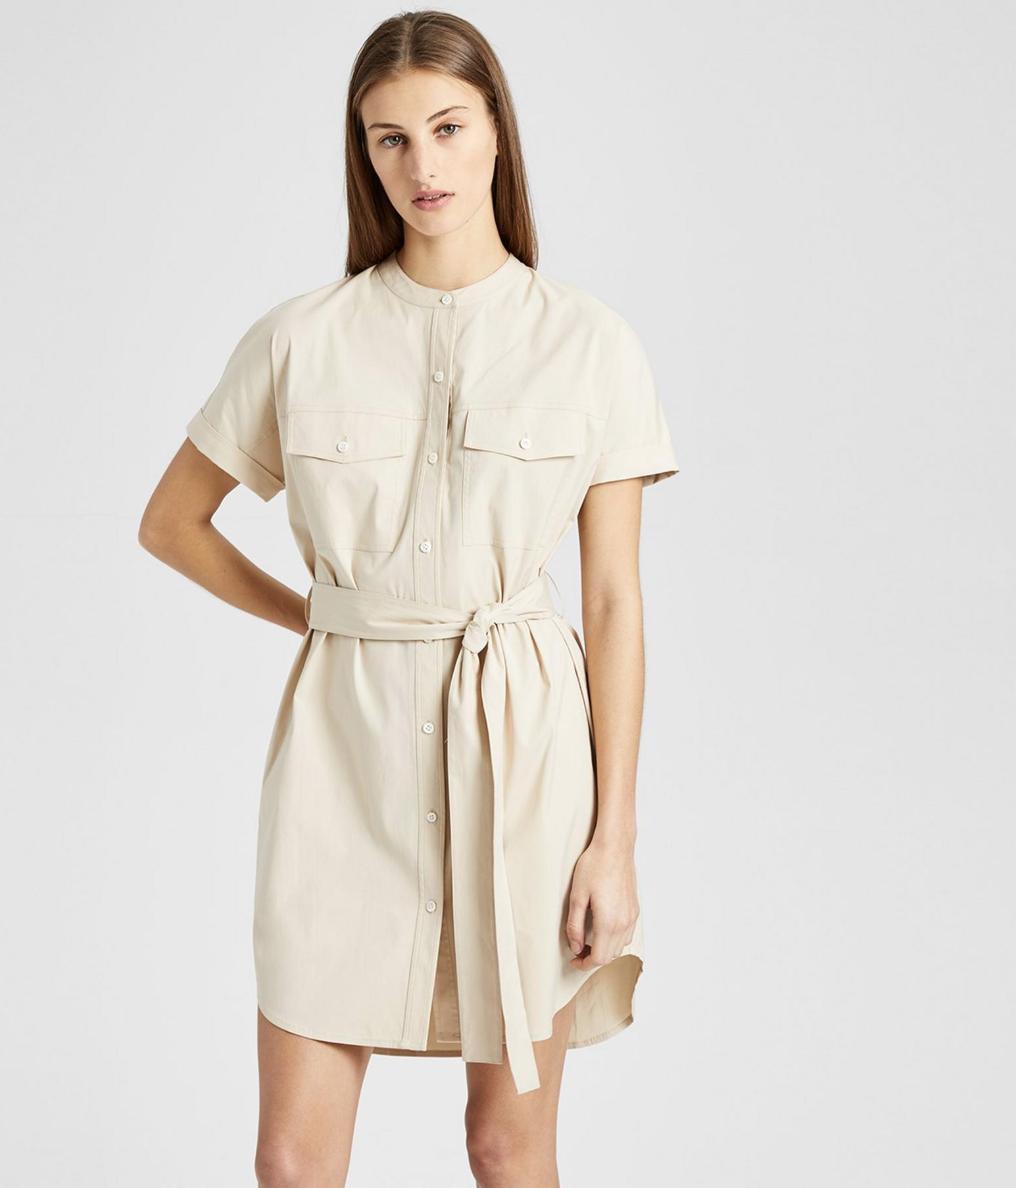 Theory Stretch Cotton Cargo Dress